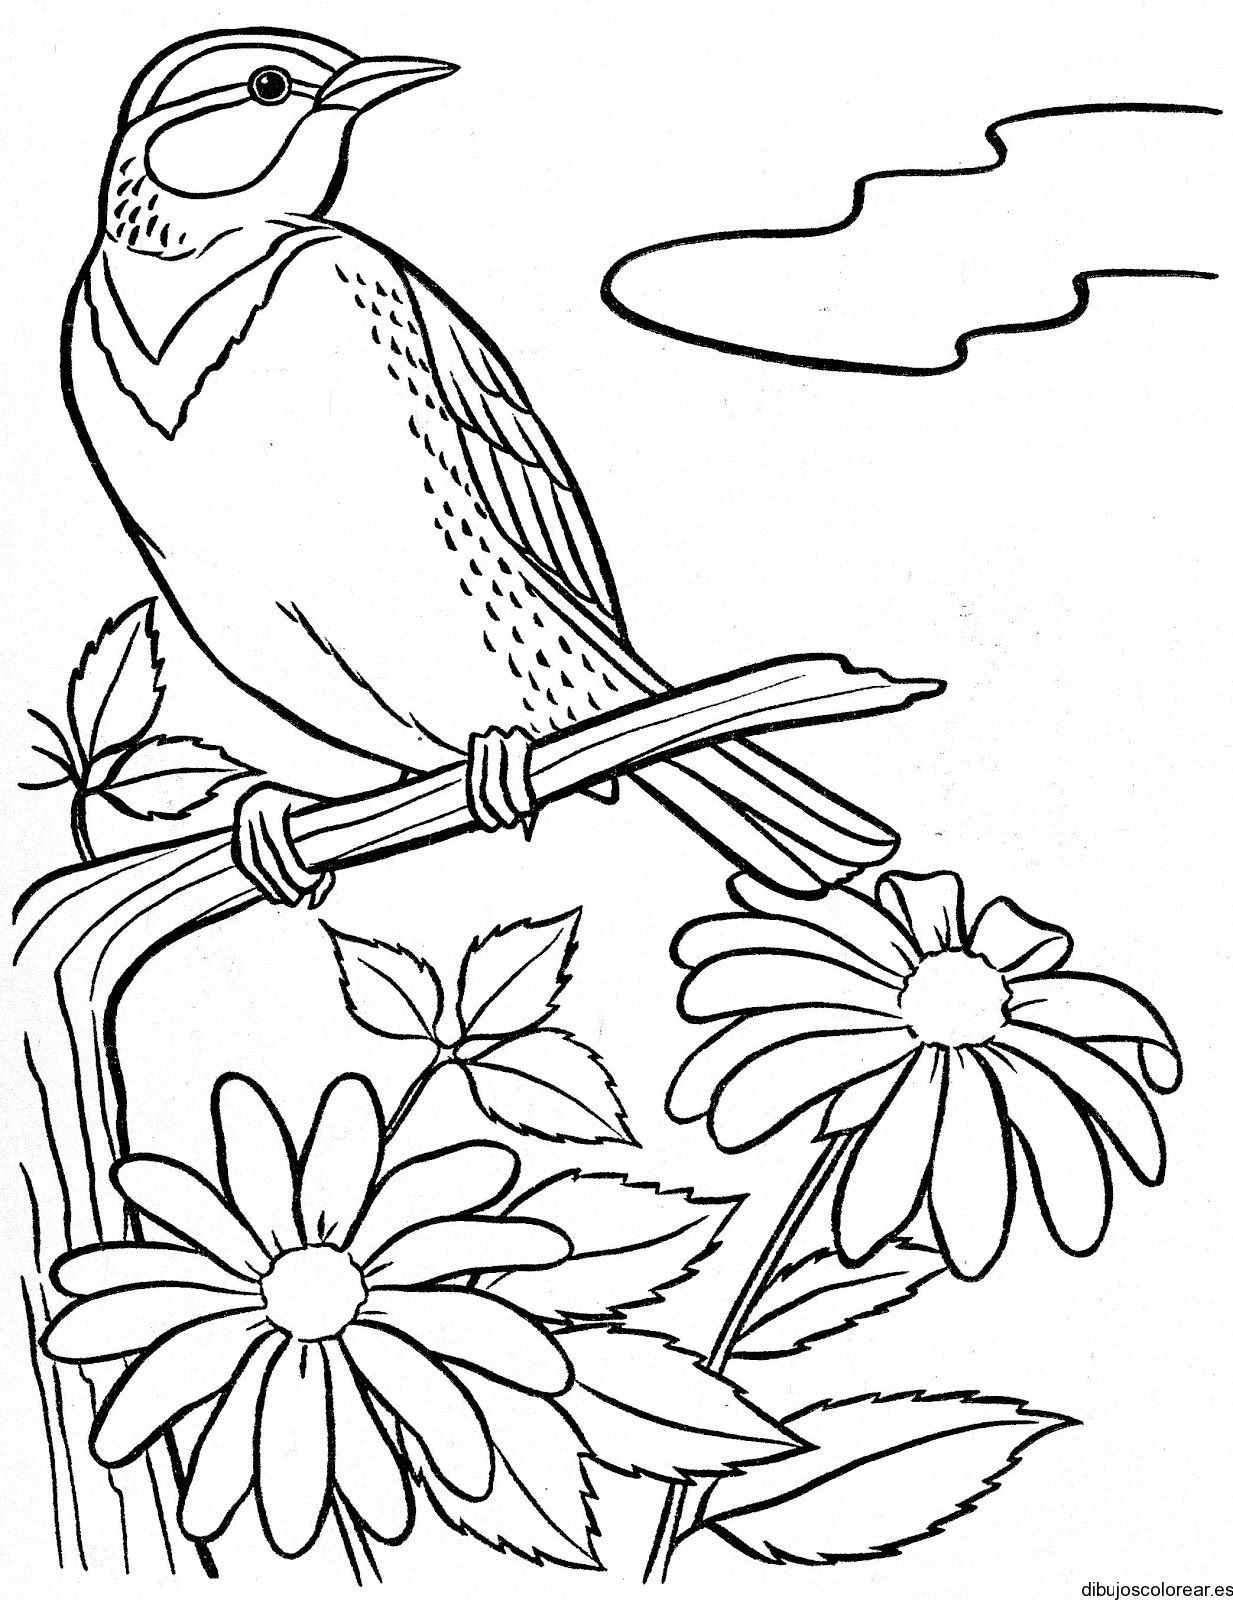 Dibujos Colorear Gratis (47) | pájaros | Pinterest | Red work ...